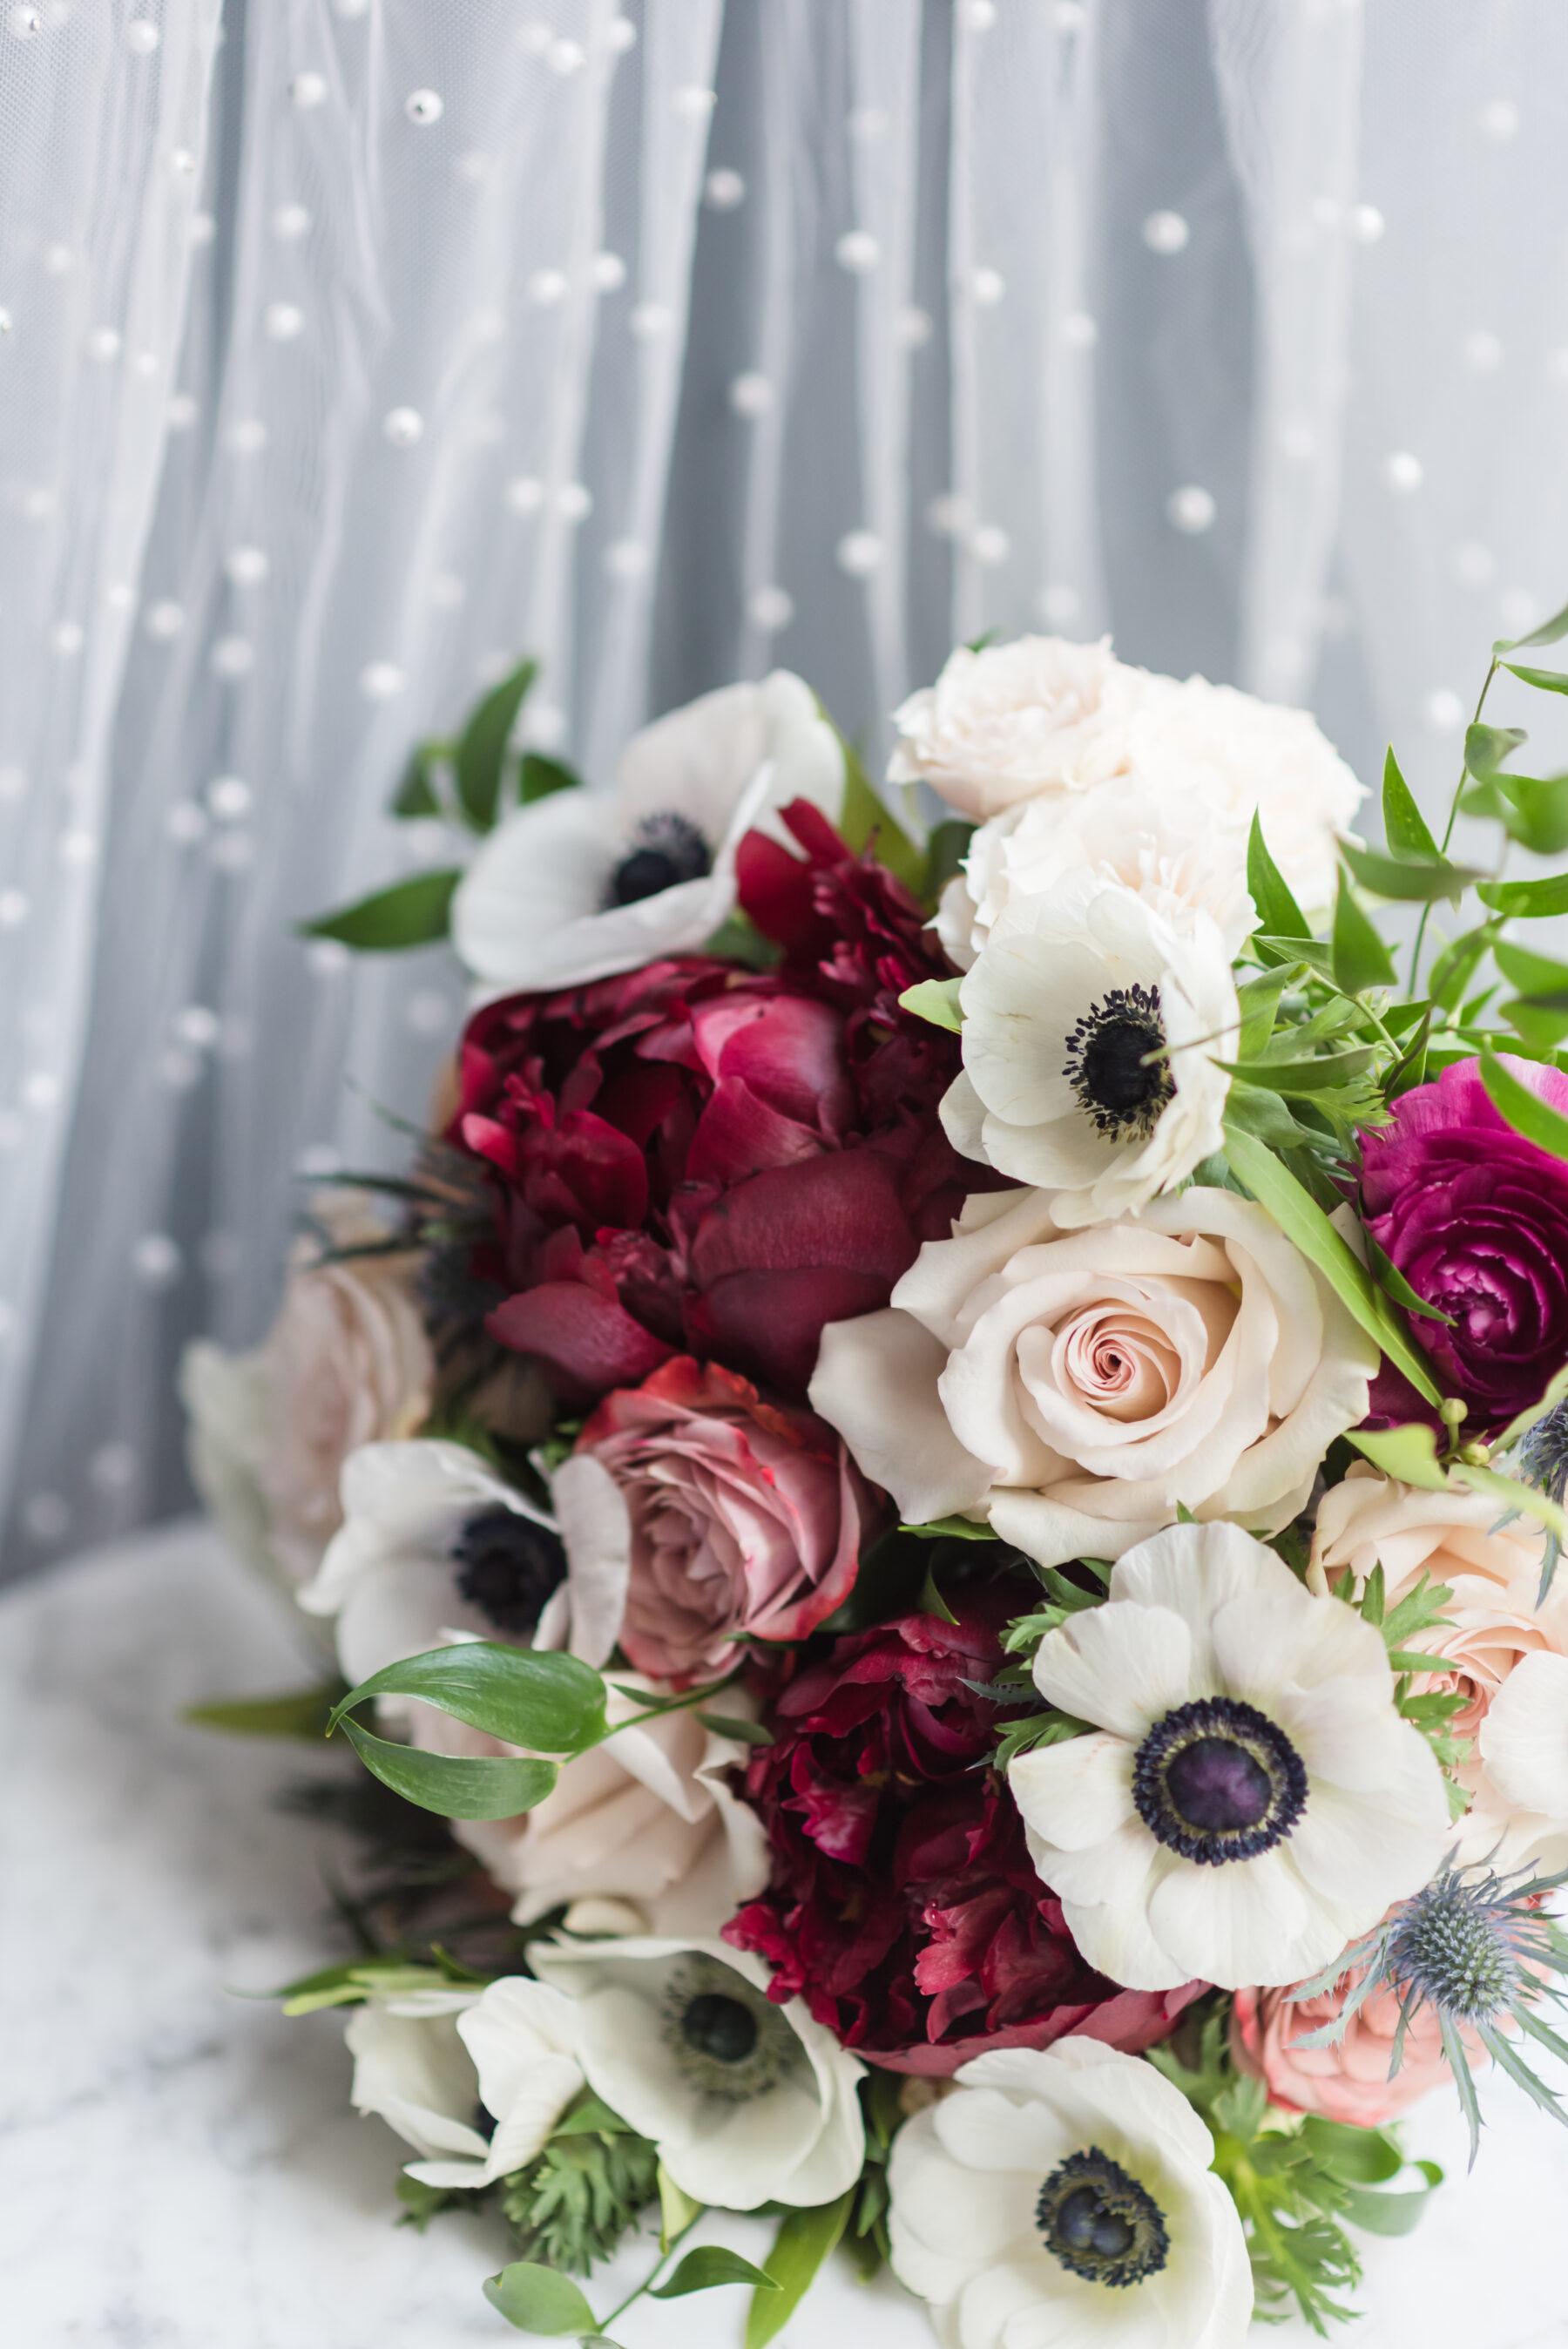 Burgundy, pink, and white wedding bouquet